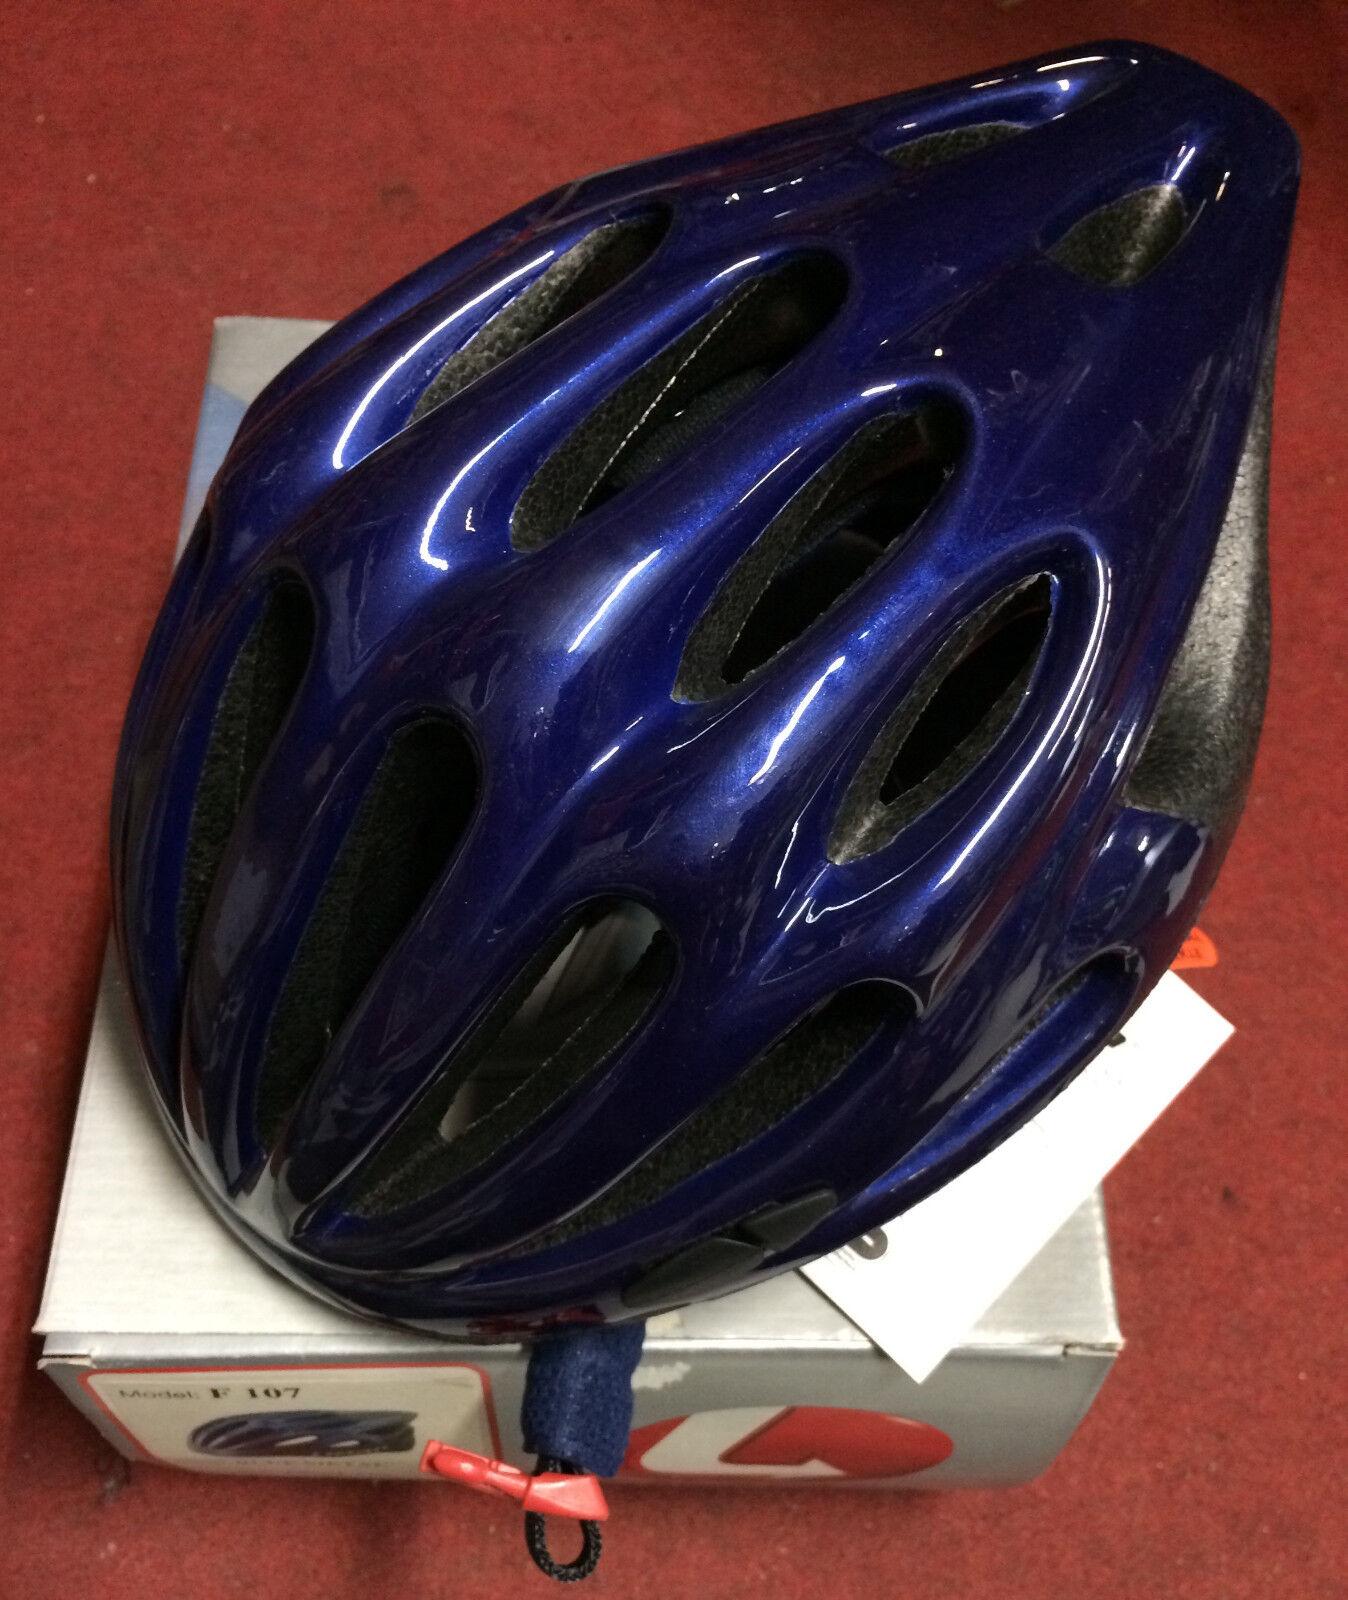 Casco bici corsa  Limar F107 road bike helmet M 54-57 XL 58-61 cm bluee metal  clearance